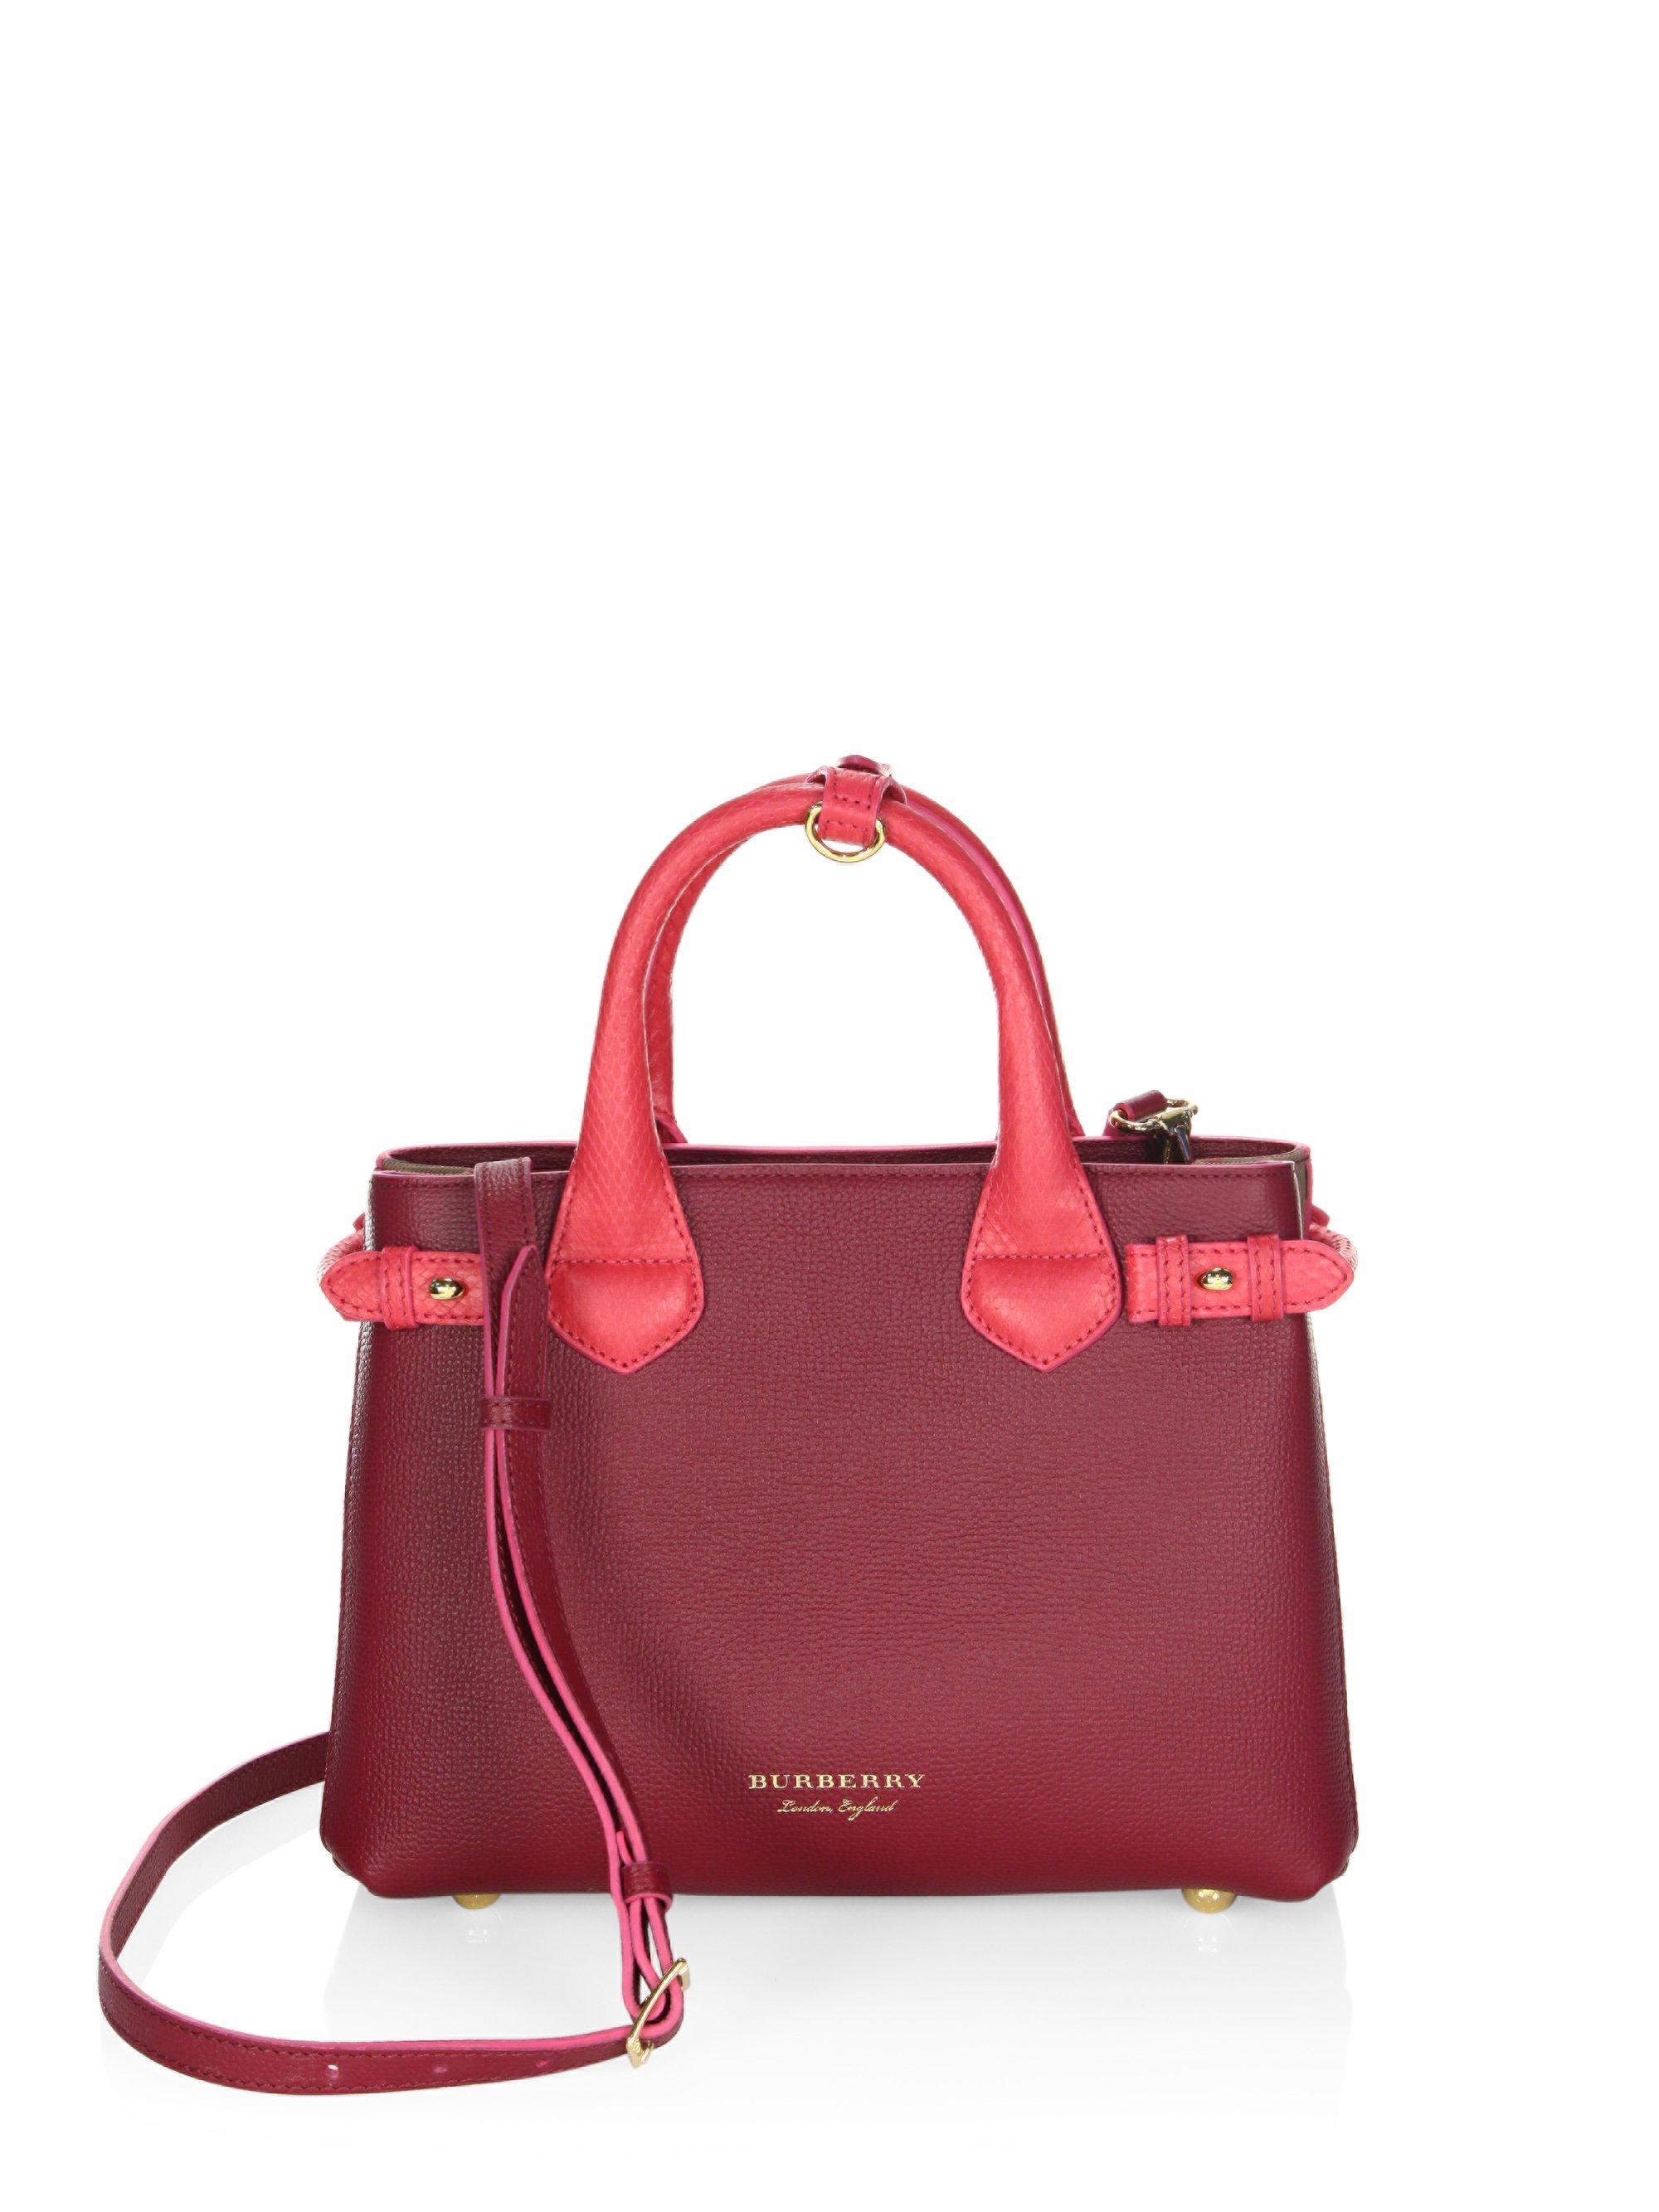 Lyst - Burberry Derby Leather Shoulder Bag in Pink 92df3c3439da8